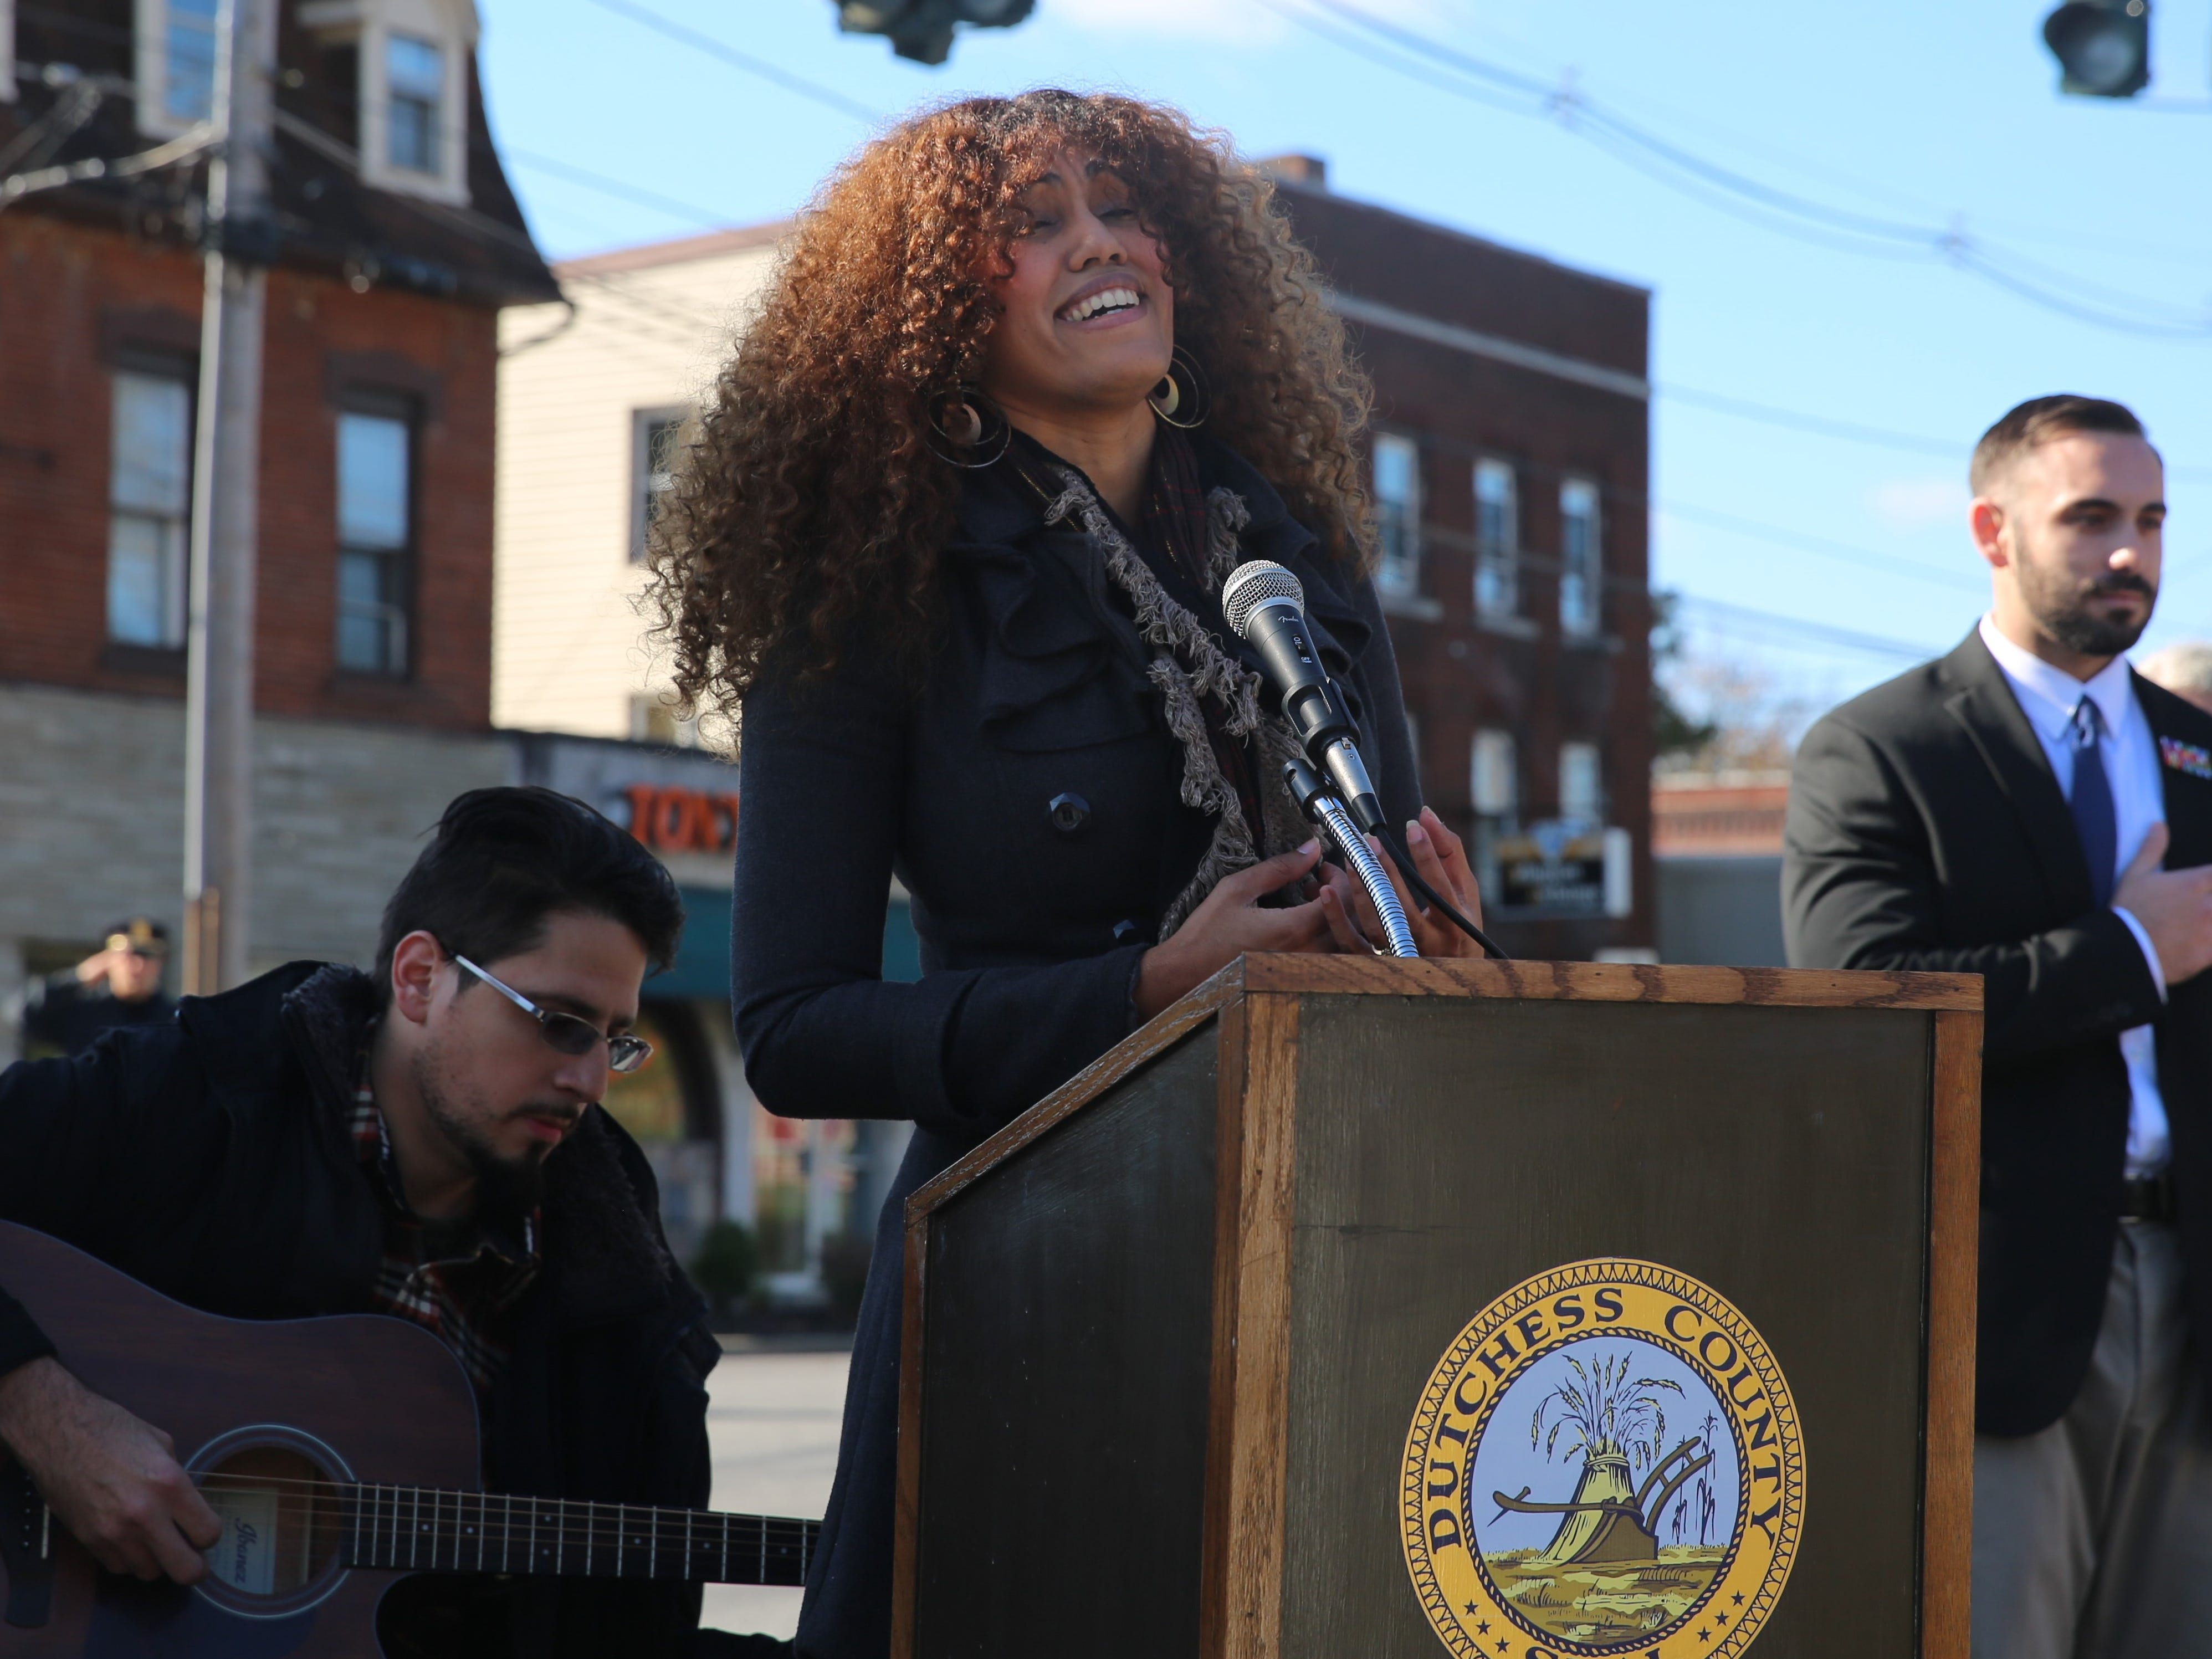 Photos: Dutchess County Veterans Day Ceremony